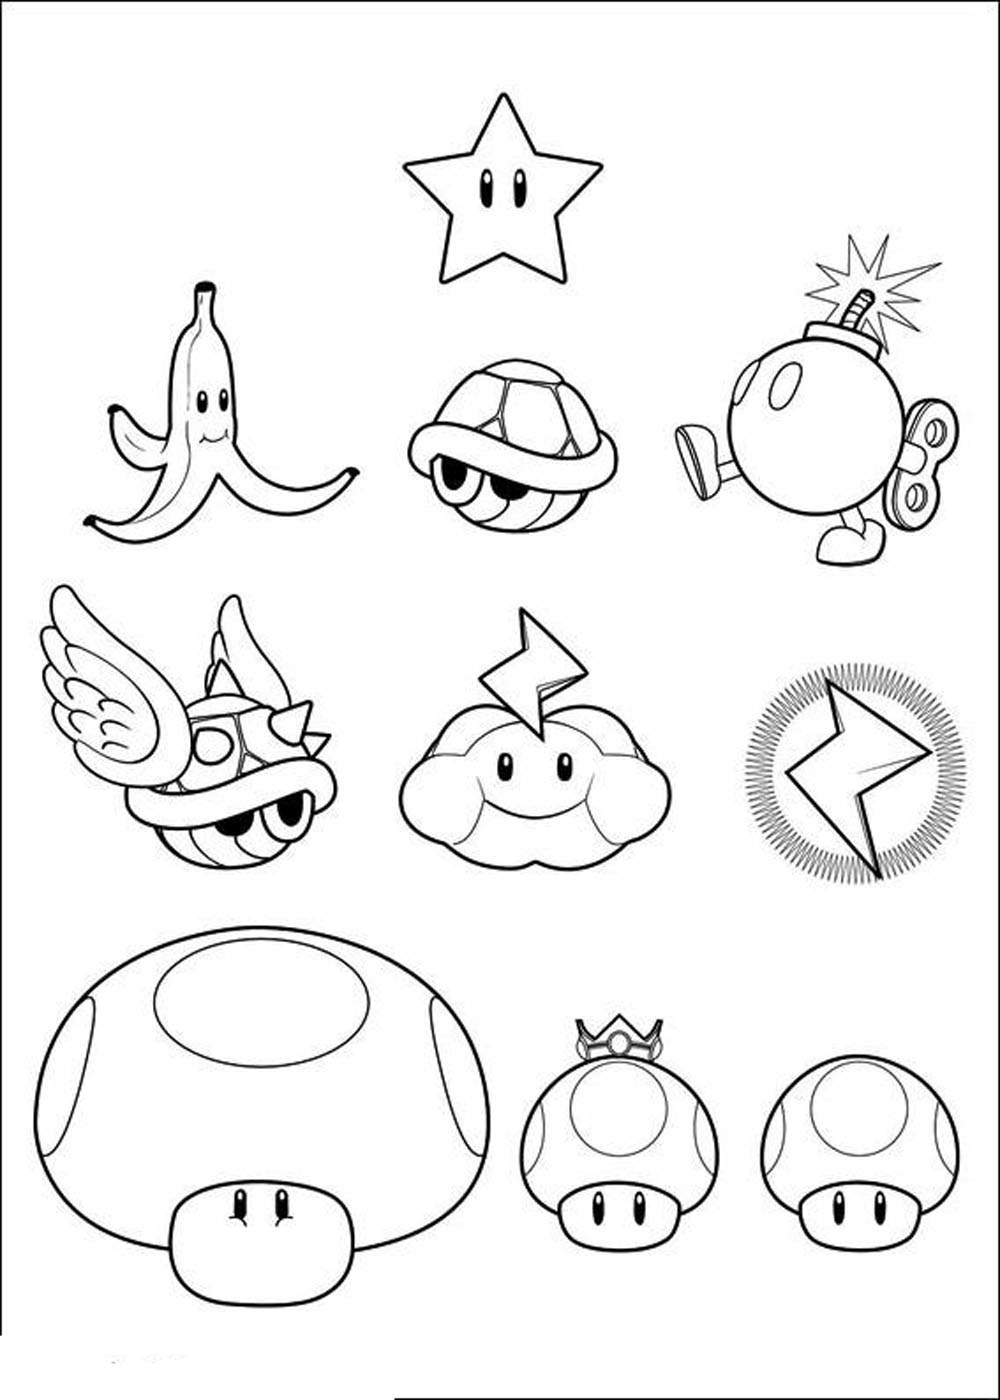 Mario Coloring Pages To Print 23 Printable Mario Coloring Pages Pictures Free Coloring Pages